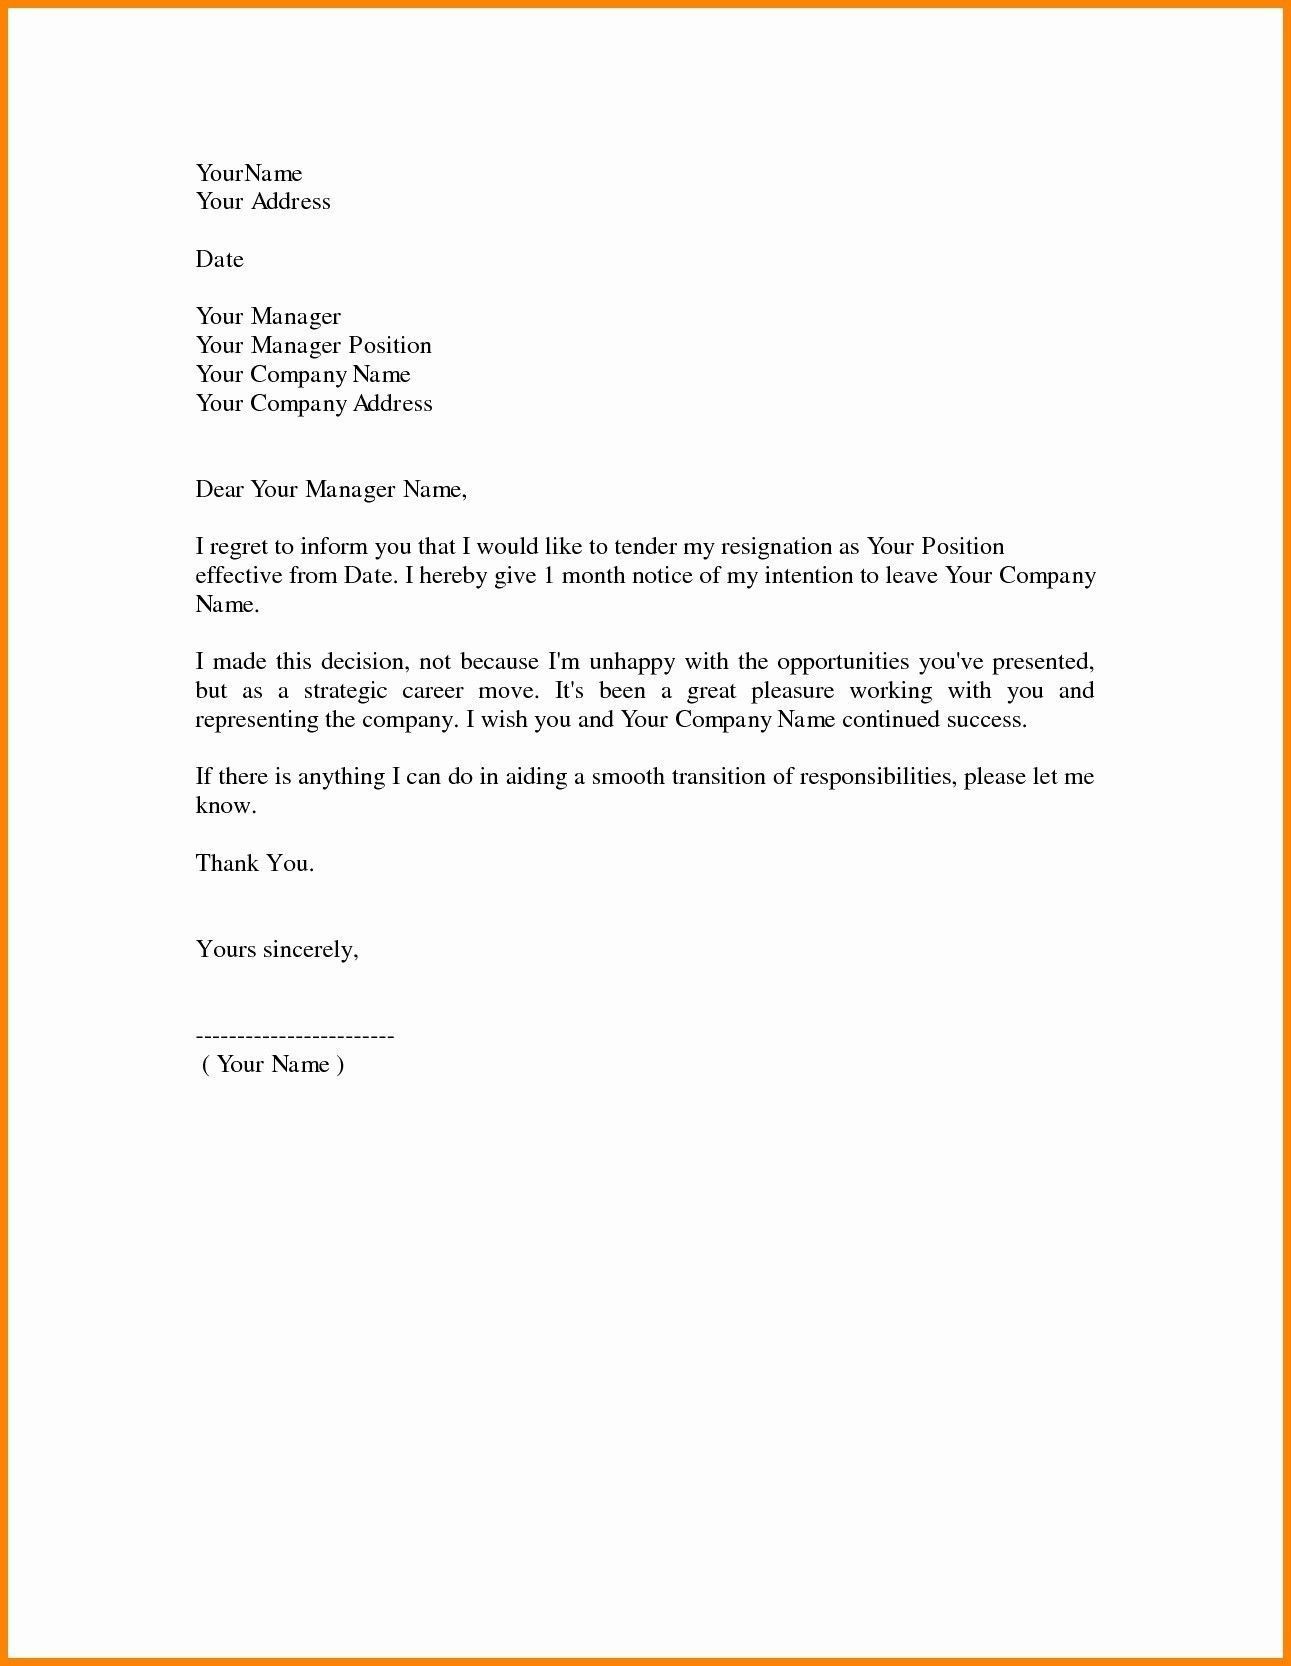 Pin Oleh Joko Di Business Template Pinterest Cover Letter For